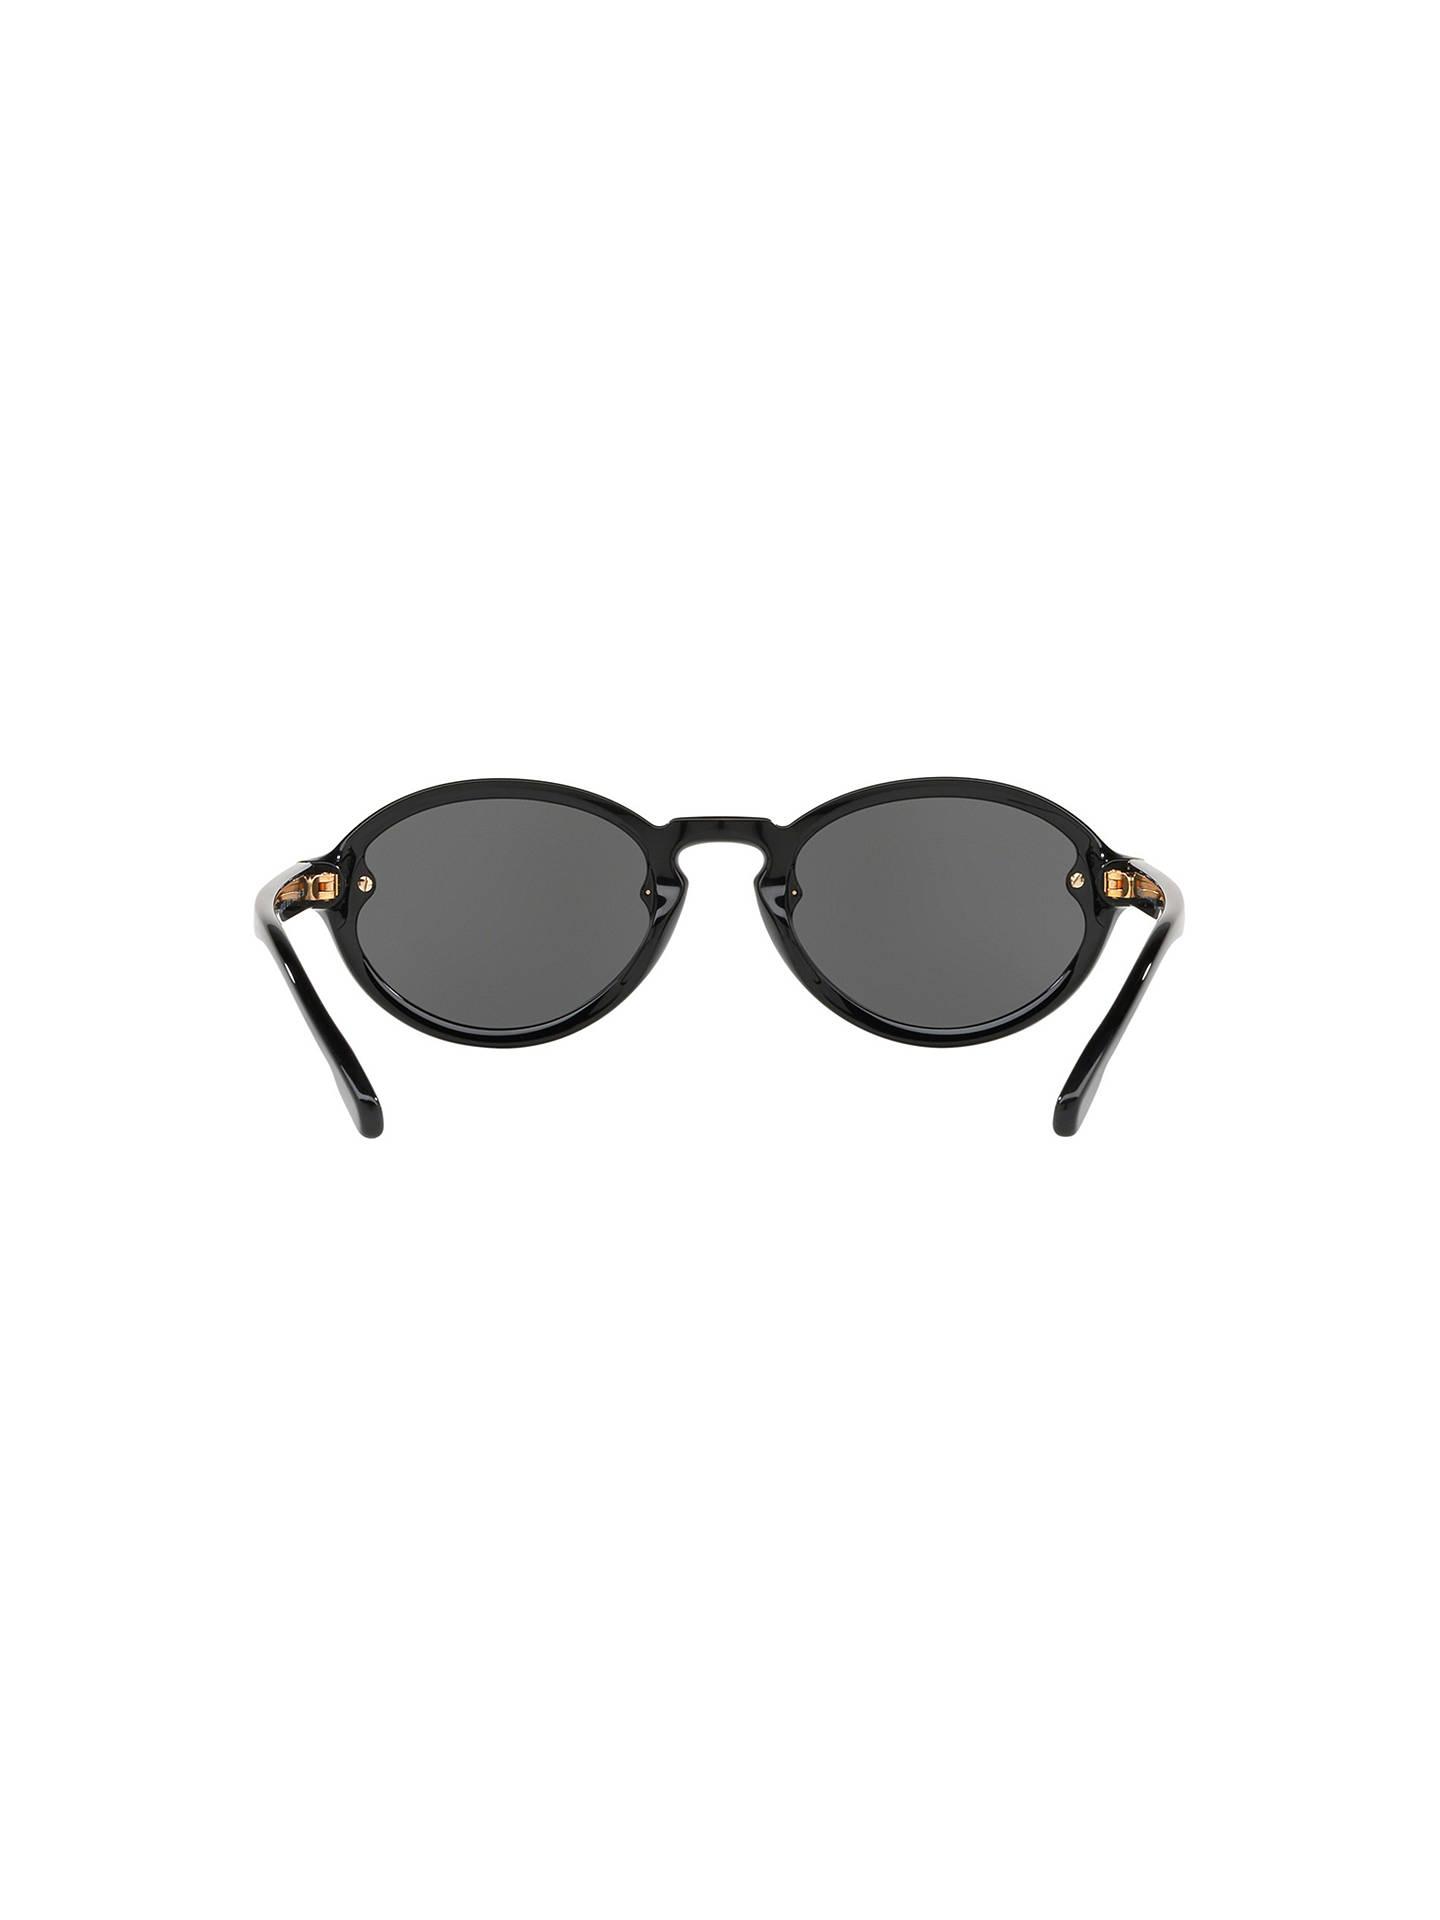 0e965ed575 Versace VE4352 Unisex Oval Sunglasses at John Lewis   Partners